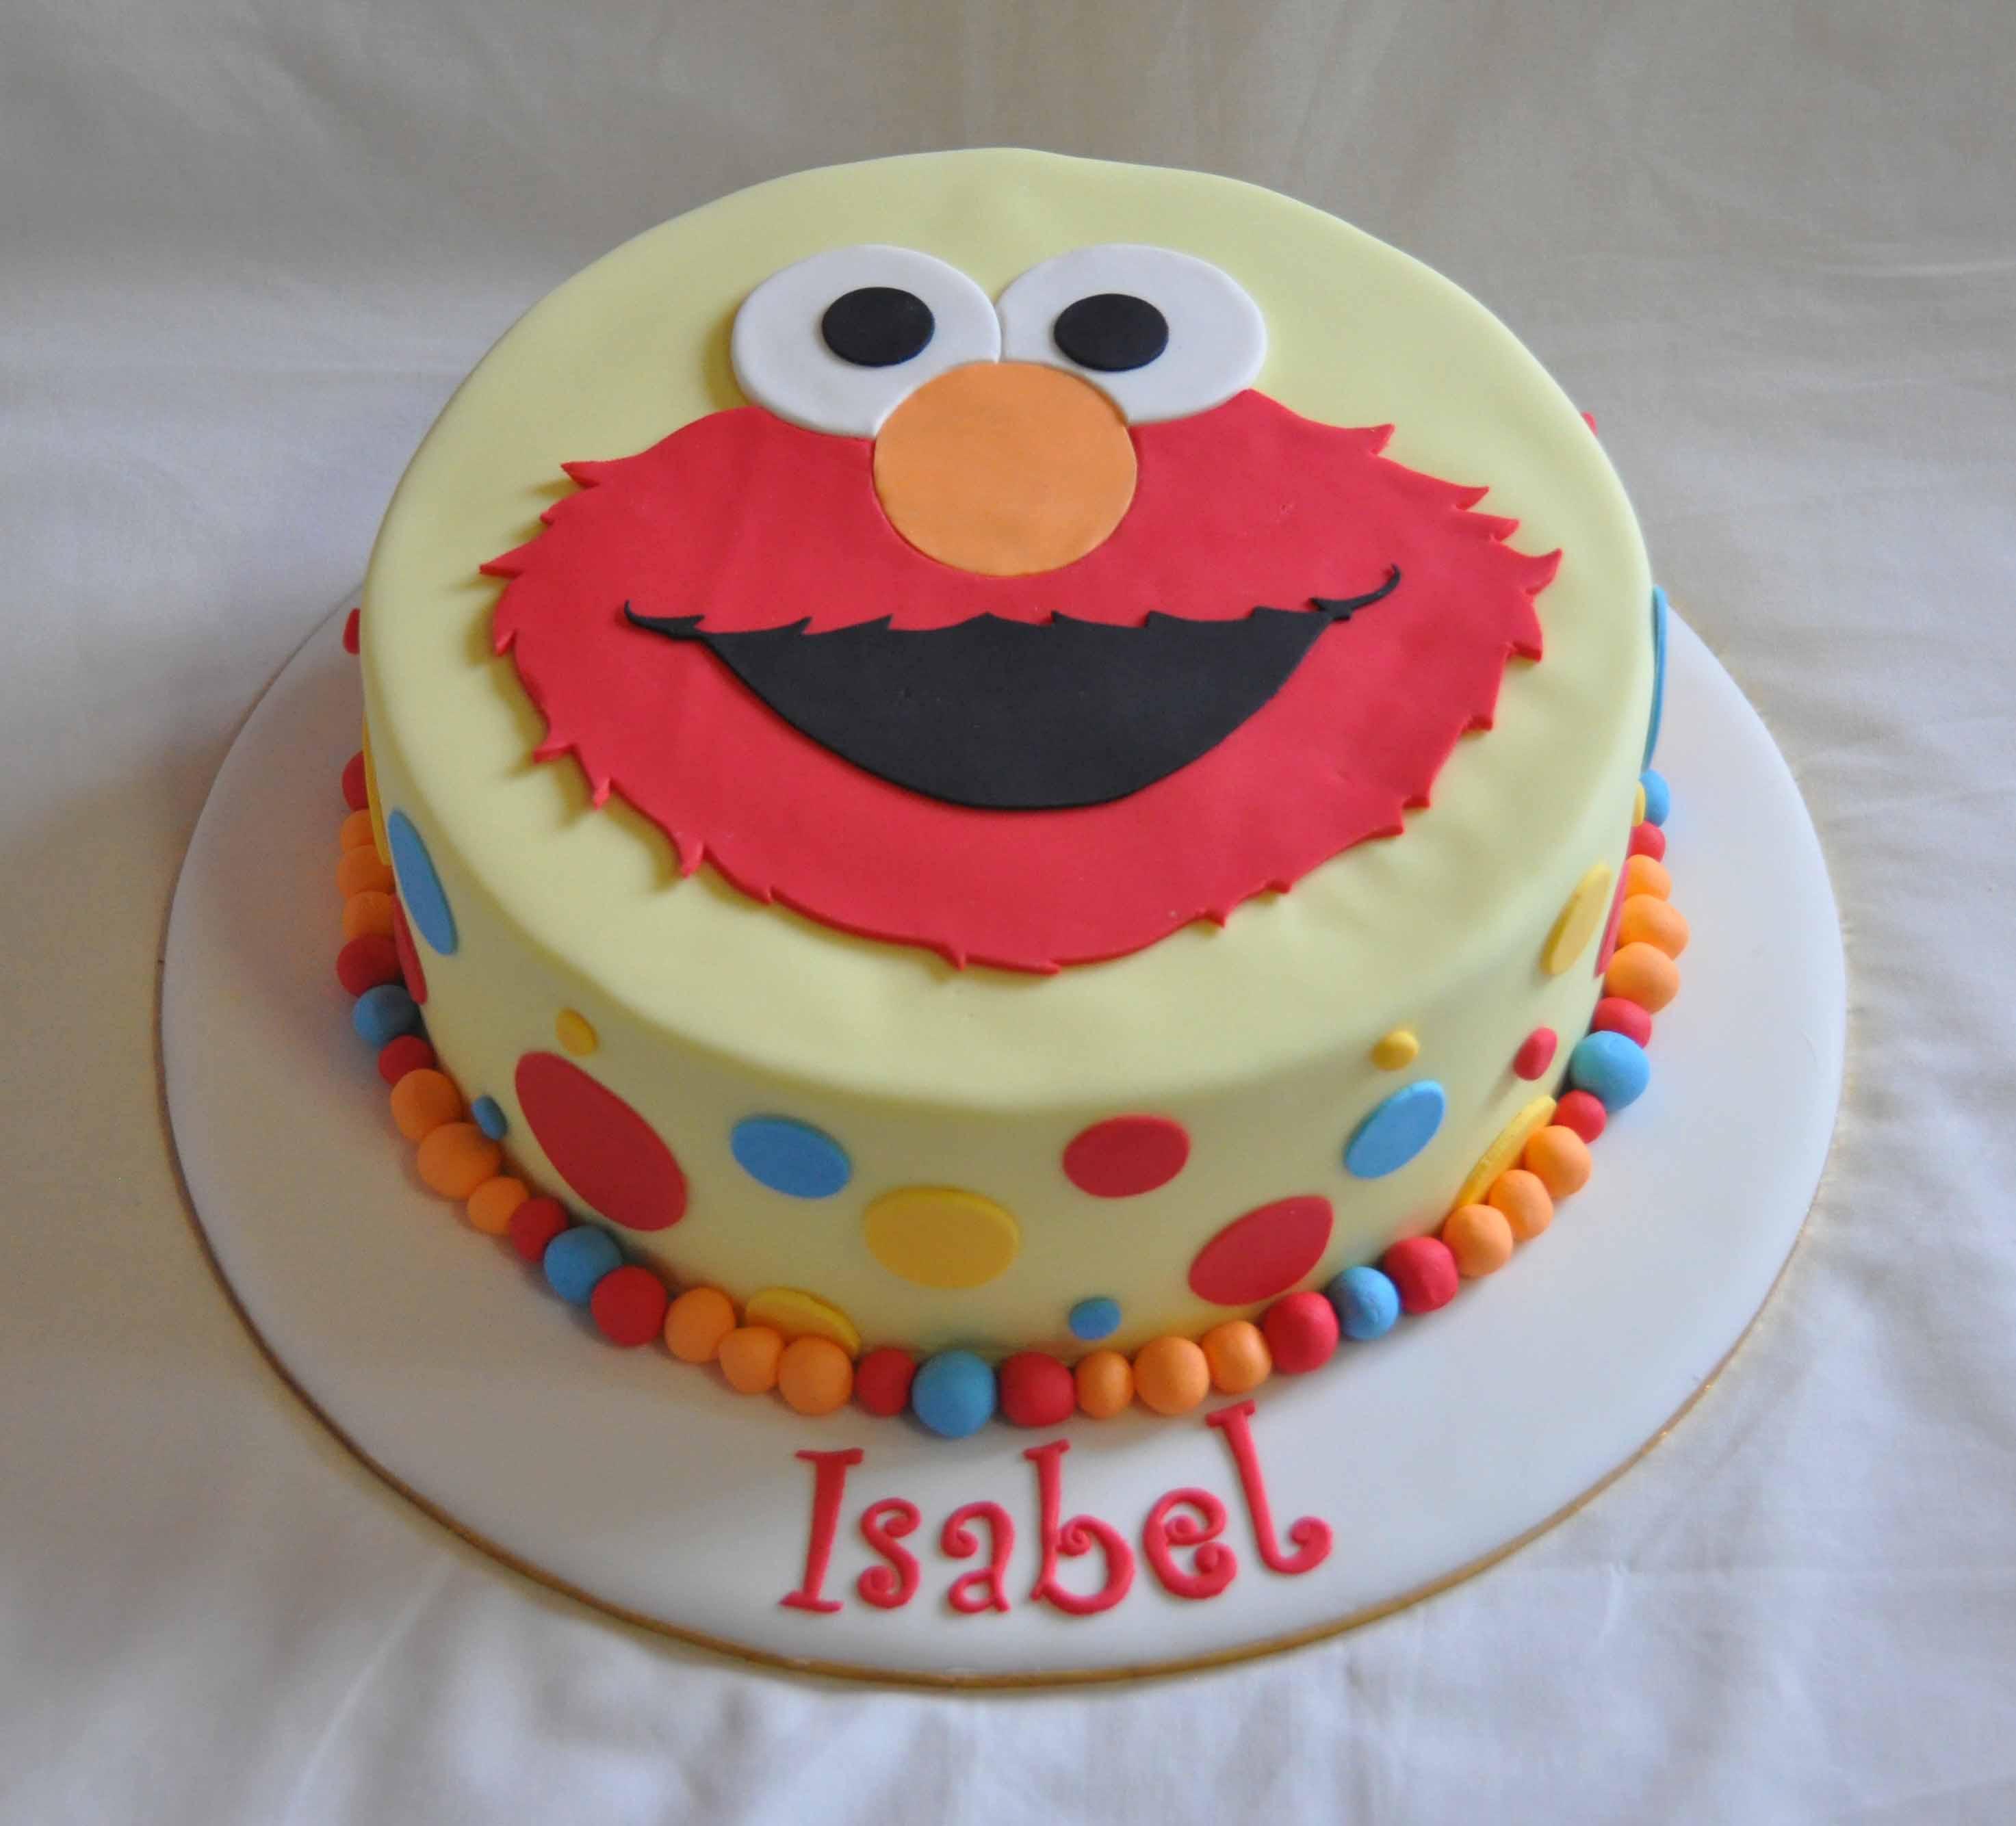 Sensational 8 Elmos Birthday Cakes Photo Elmo Birthday Cakes Ideas Elmo Funny Birthday Cards Online Sheoxdamsfinfo